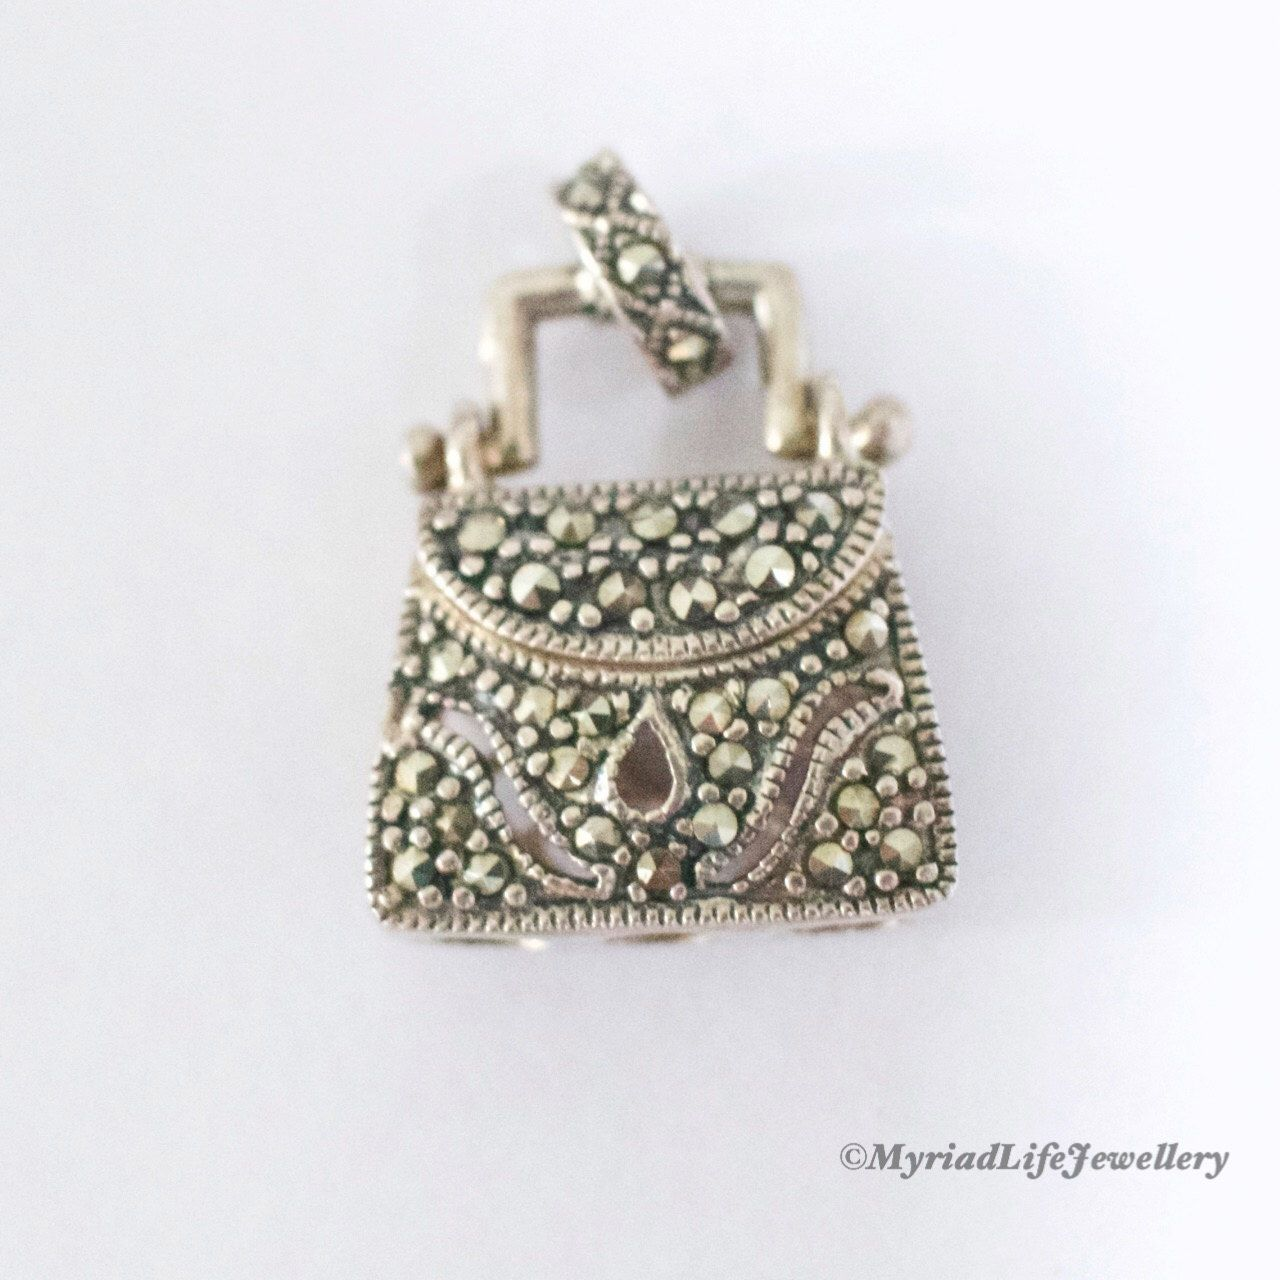 925 Silver Marcasite Handbag Purse Charm or Pendant by MyriadLifeVintage on Etsy https://www.etsy.com/uk/listing/465421143/925-silver-marcasite-handbag-purse-charm